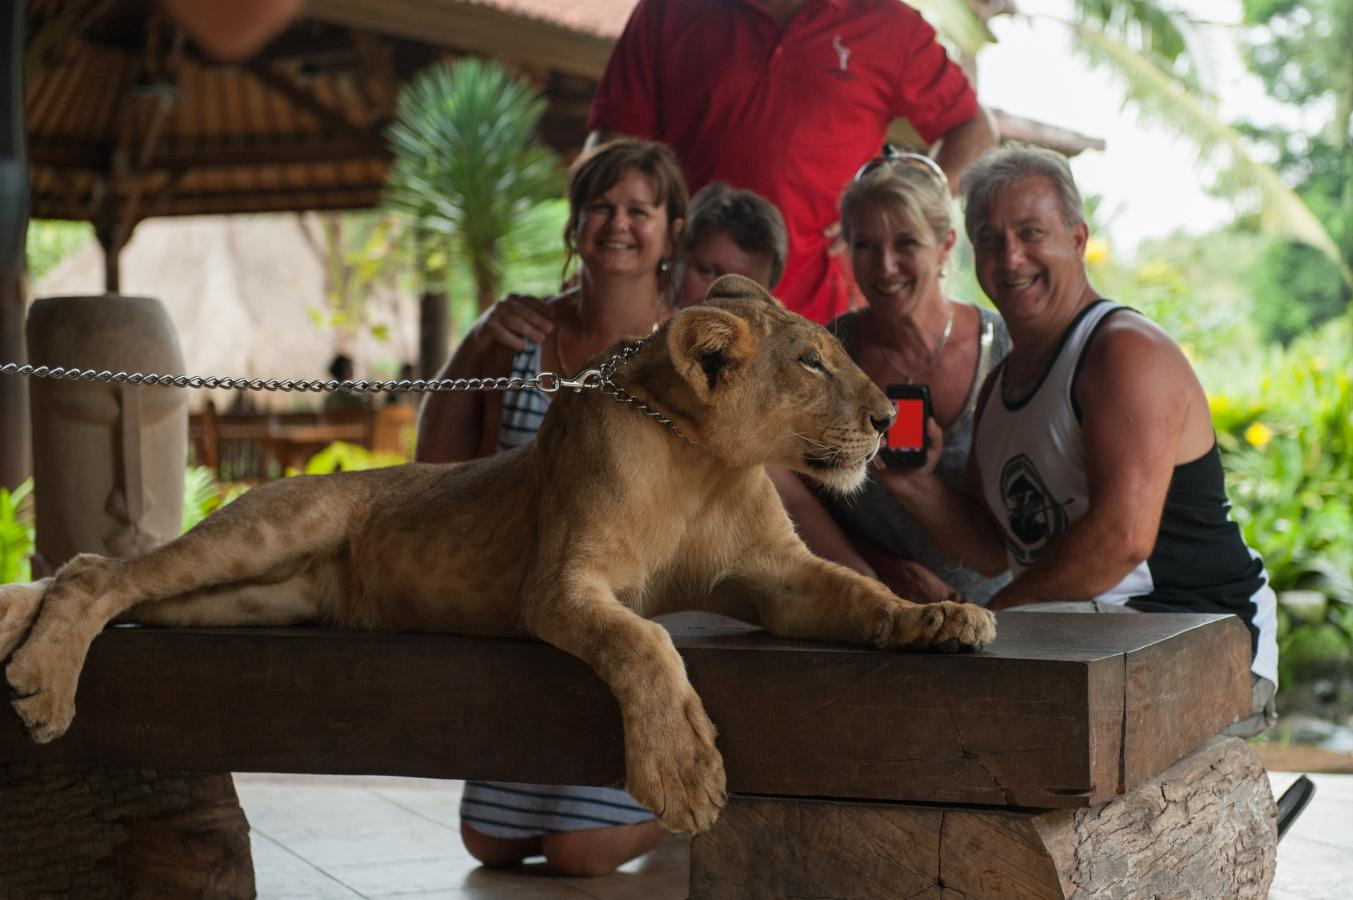 tourists-posing-with-a-young-lion-bali-zoo-singapadu-bali-2013